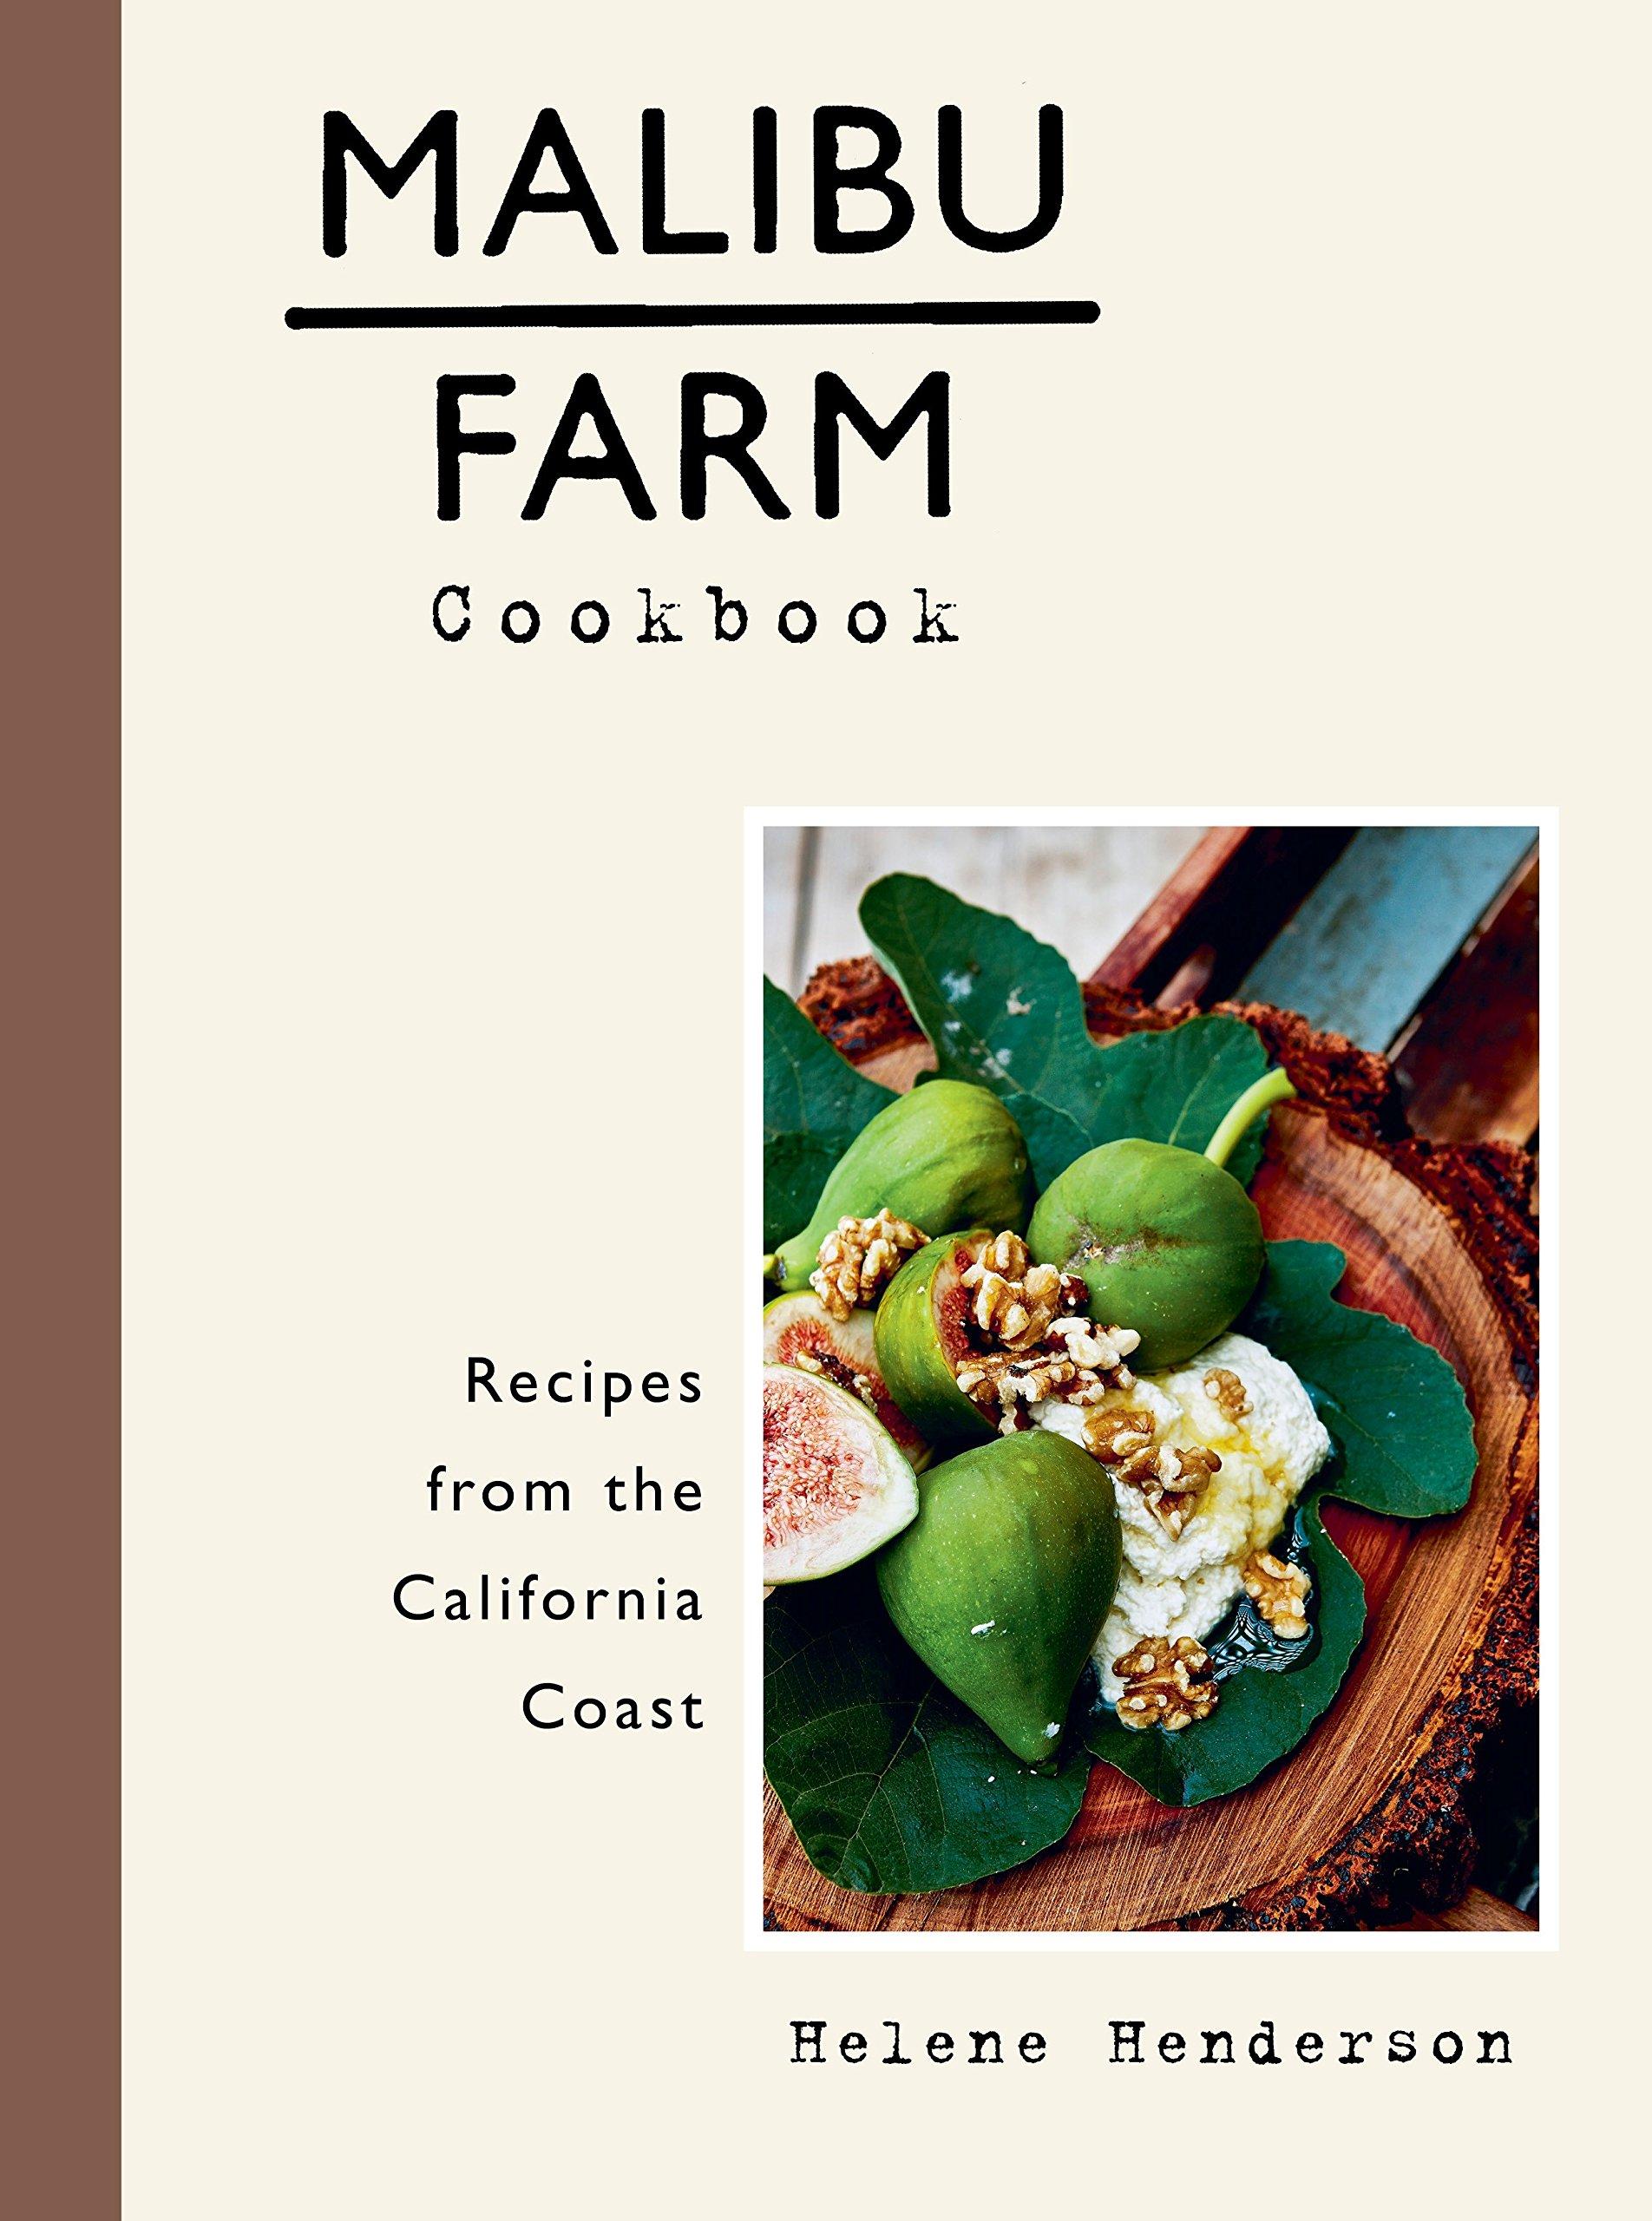 Malibu Farm Cookbook: Recipes from the California Coast by Clarkson Potter